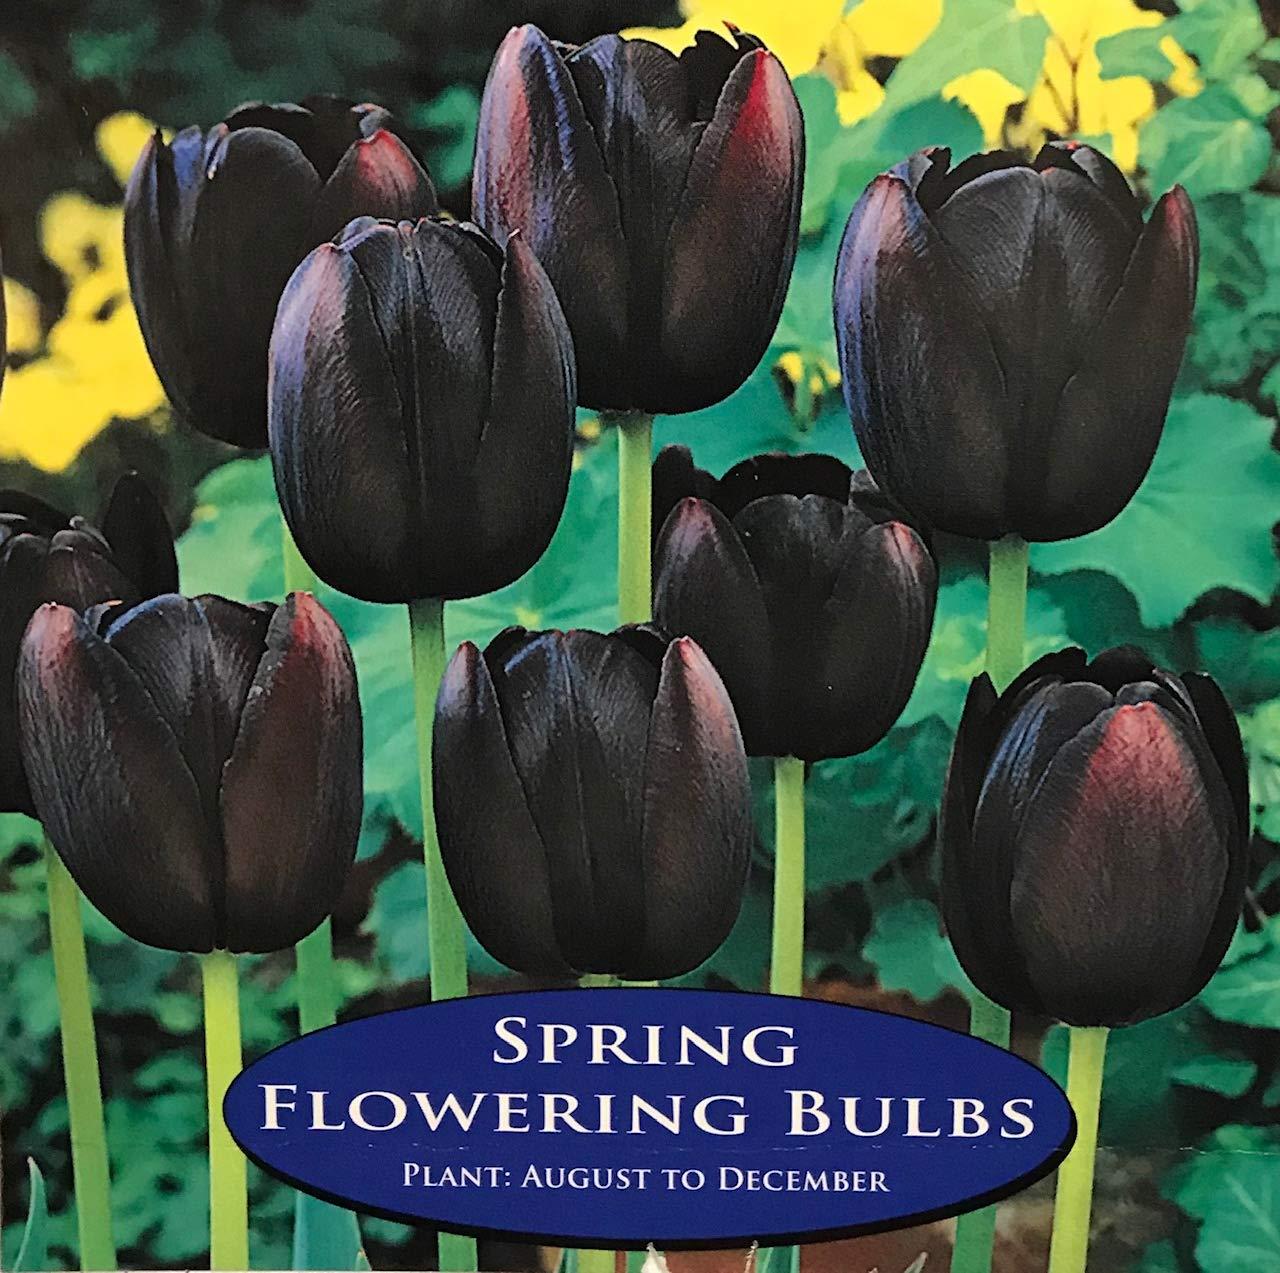 JBA Tulip Bulbs Queen of the Night (30 Bulbs) Spring Flowering